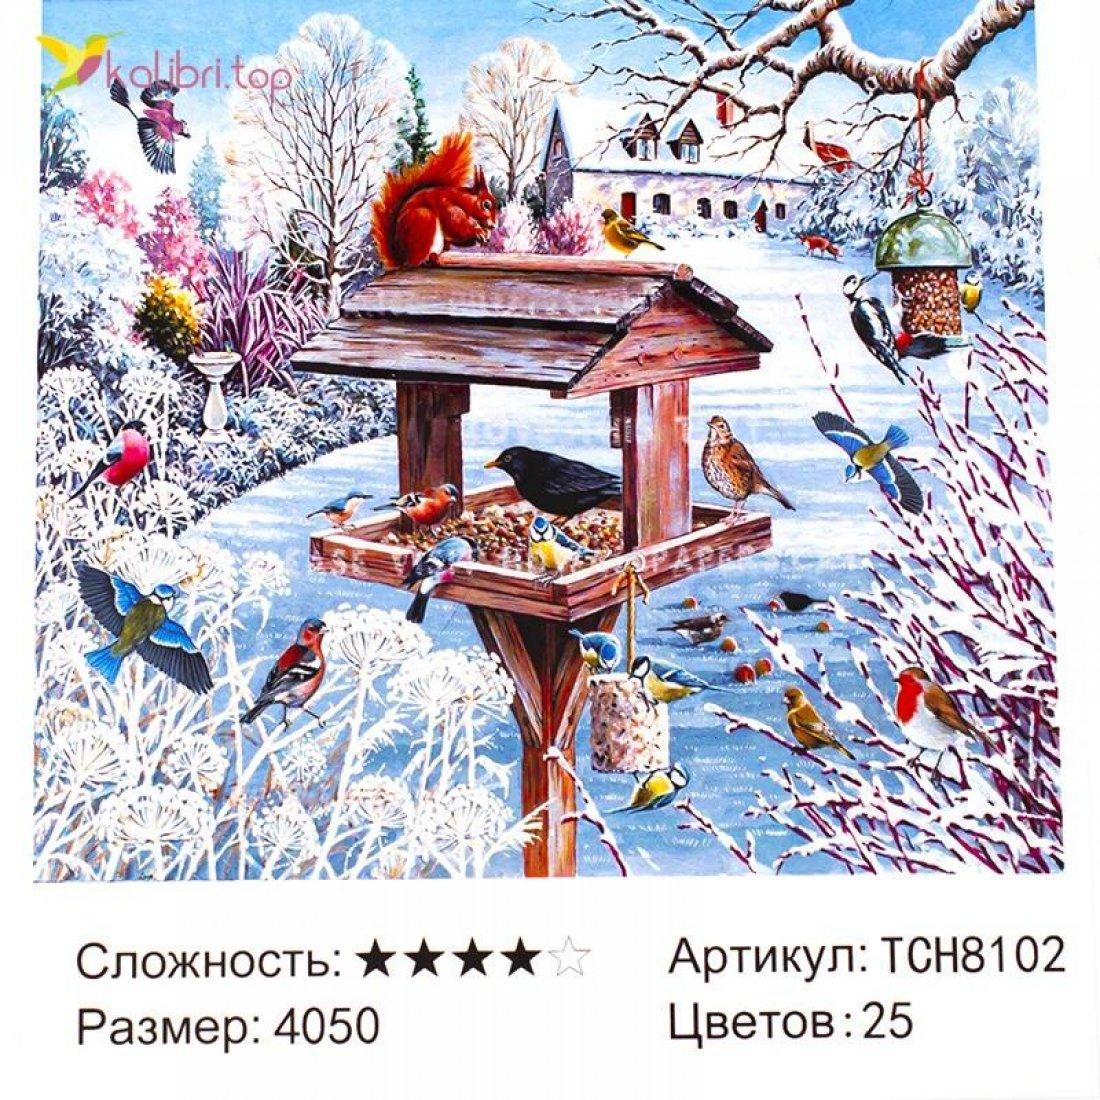 Алмазная живопись по номерам Кормушка 40*50 см оптом фото 03